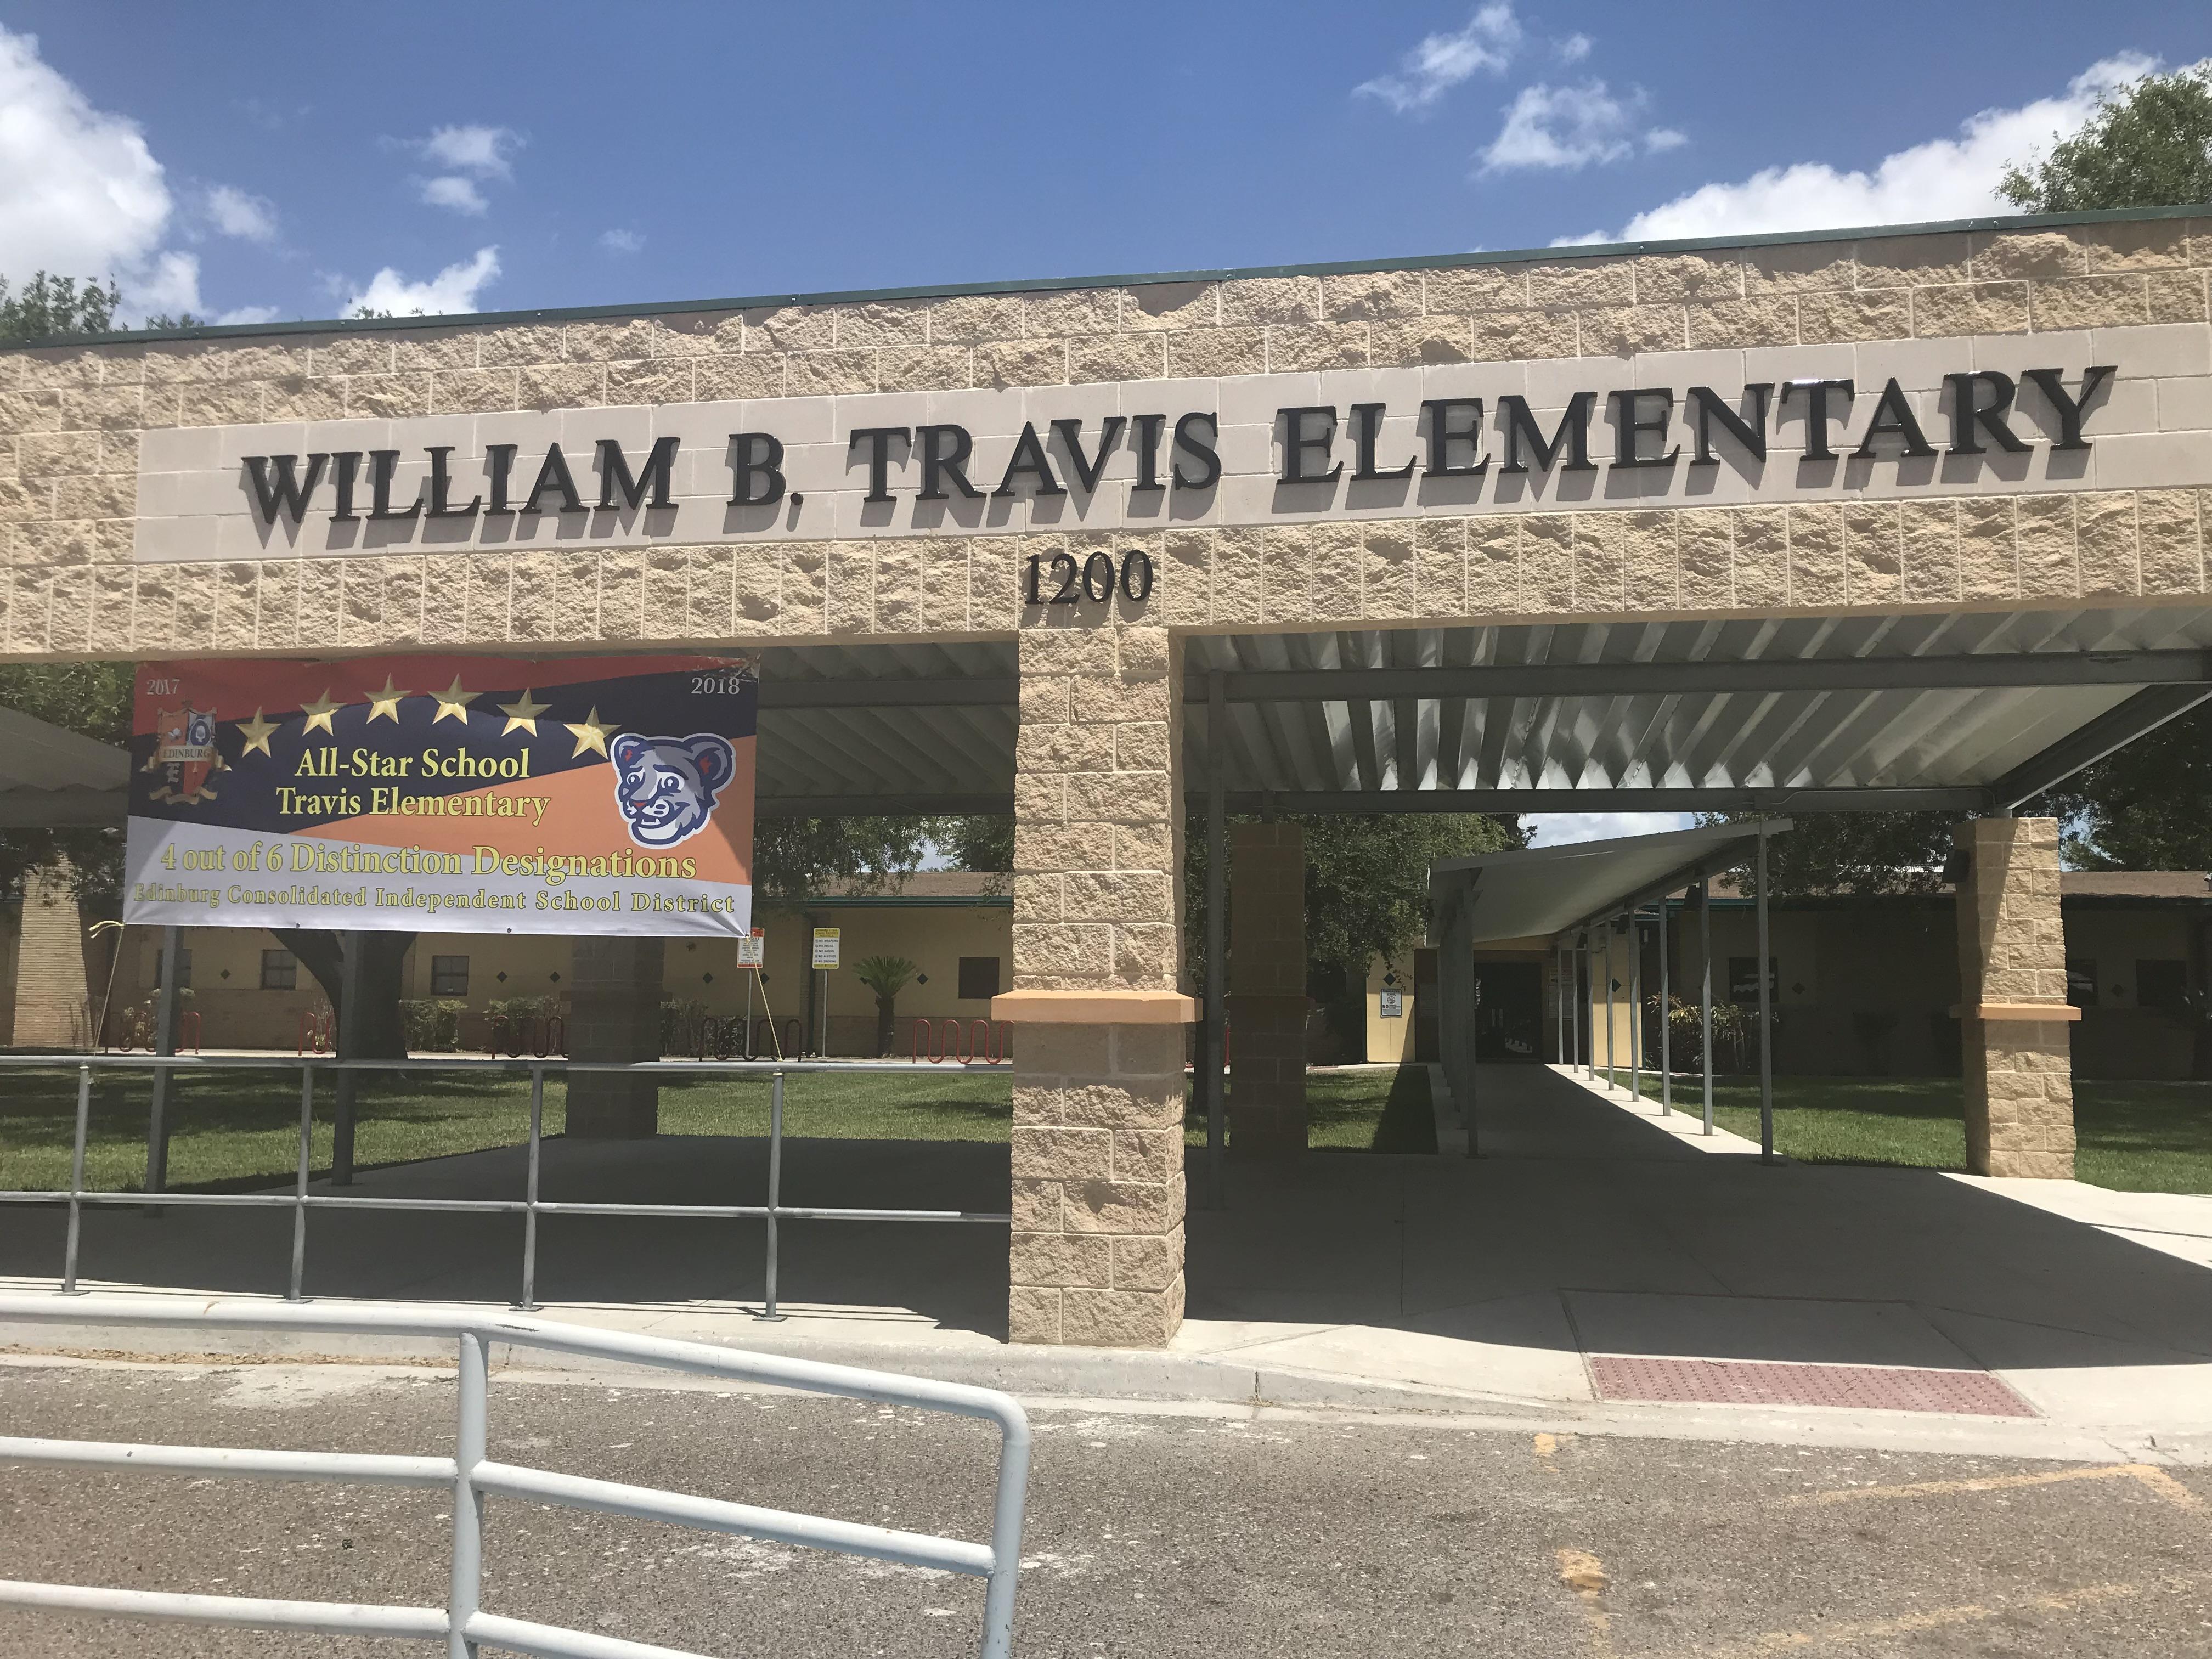 Wm. B. Travis Elementary